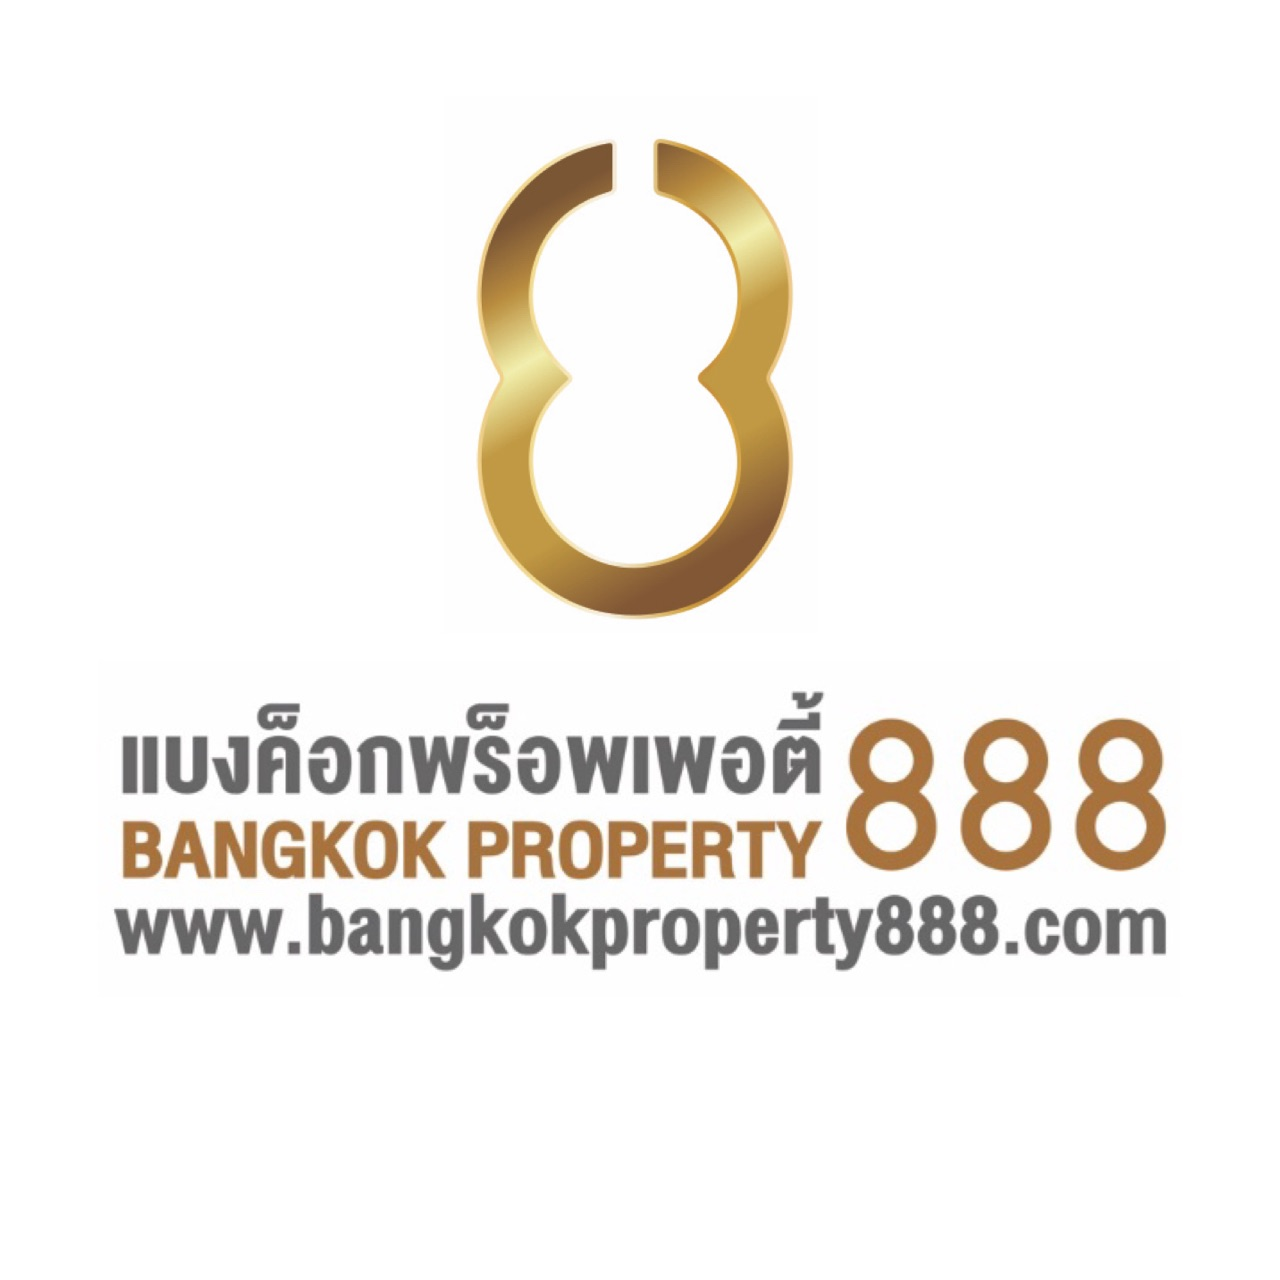 Agent - BangkokProperty888 logo